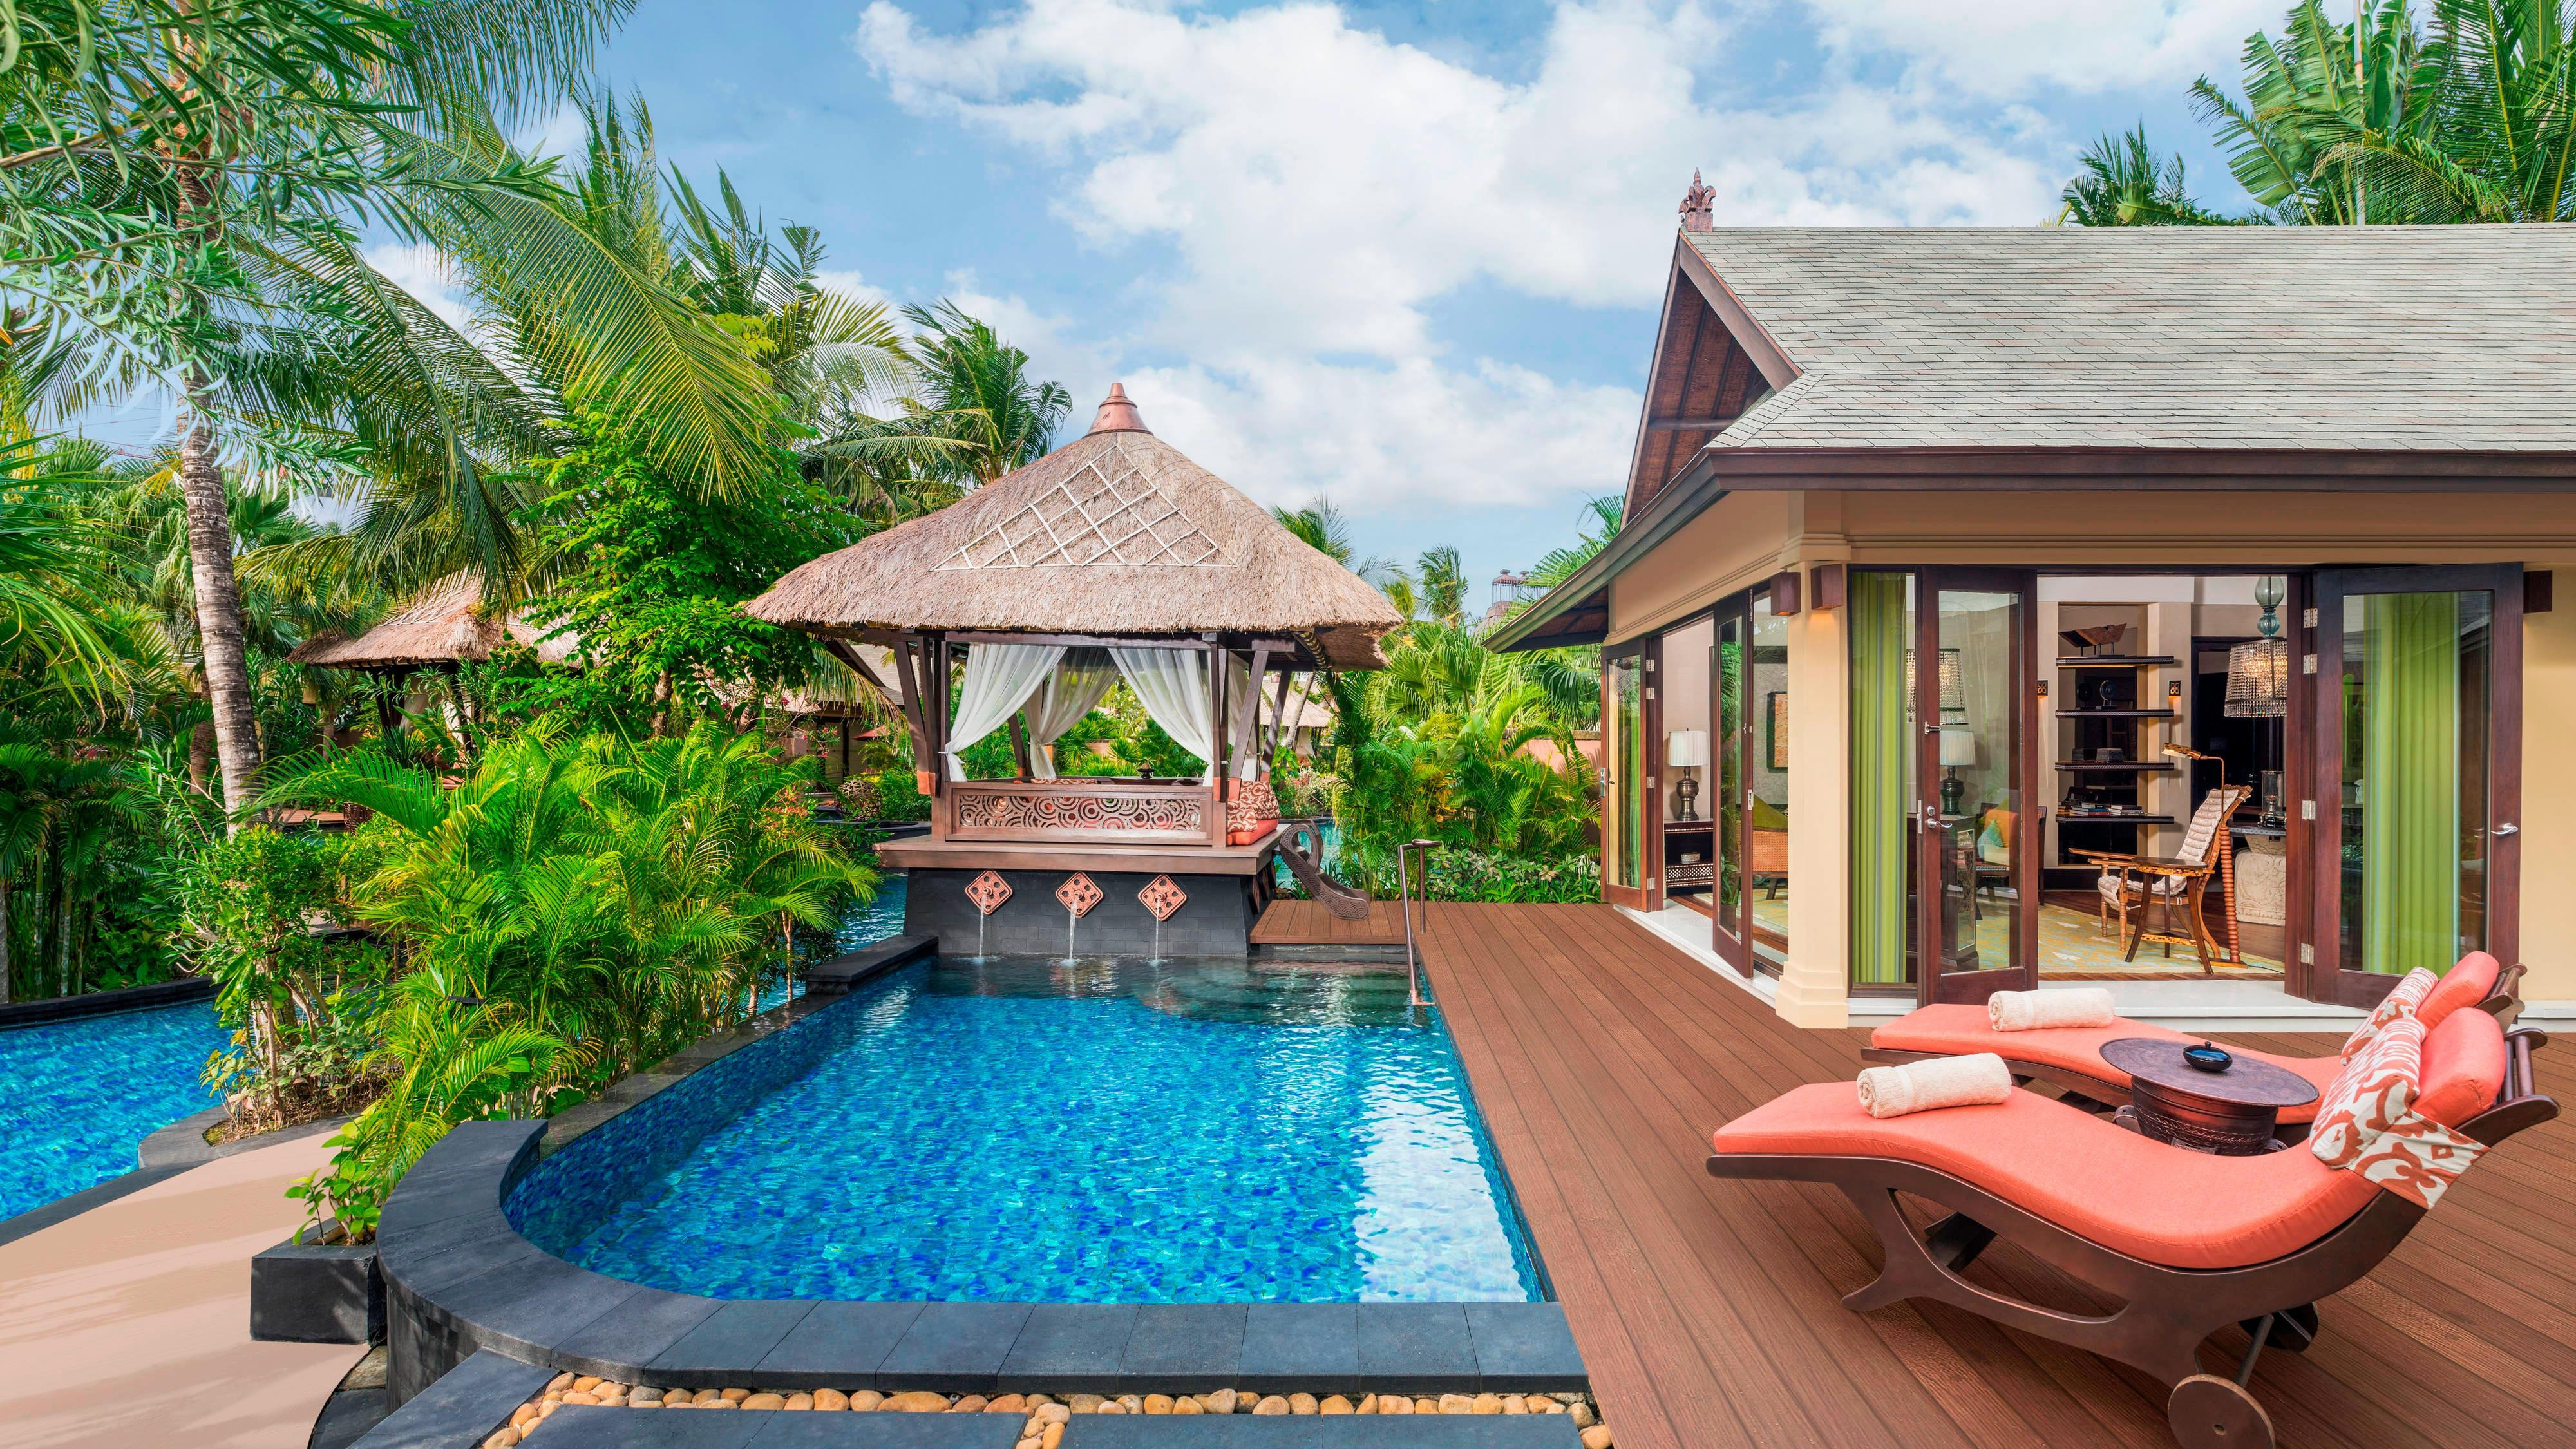 5-star Hotels In Nusa Dua Bali St. Regis Resort